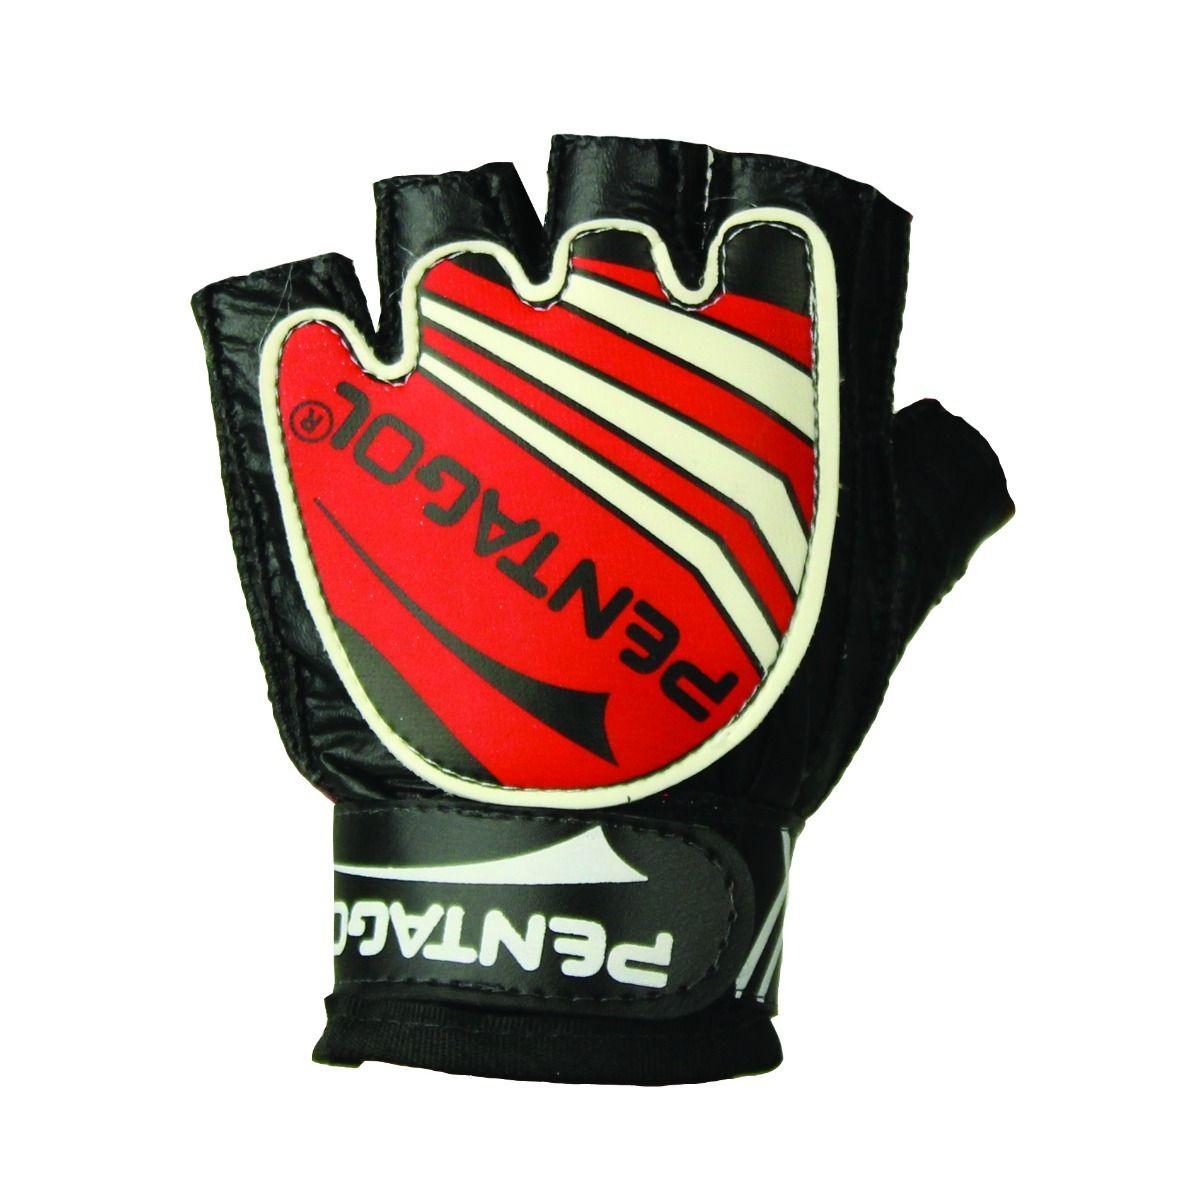 8ce3cec0a0ed5 Luva de Goleiro Pentagol Futsal Bones Infantil - Energia Esportes